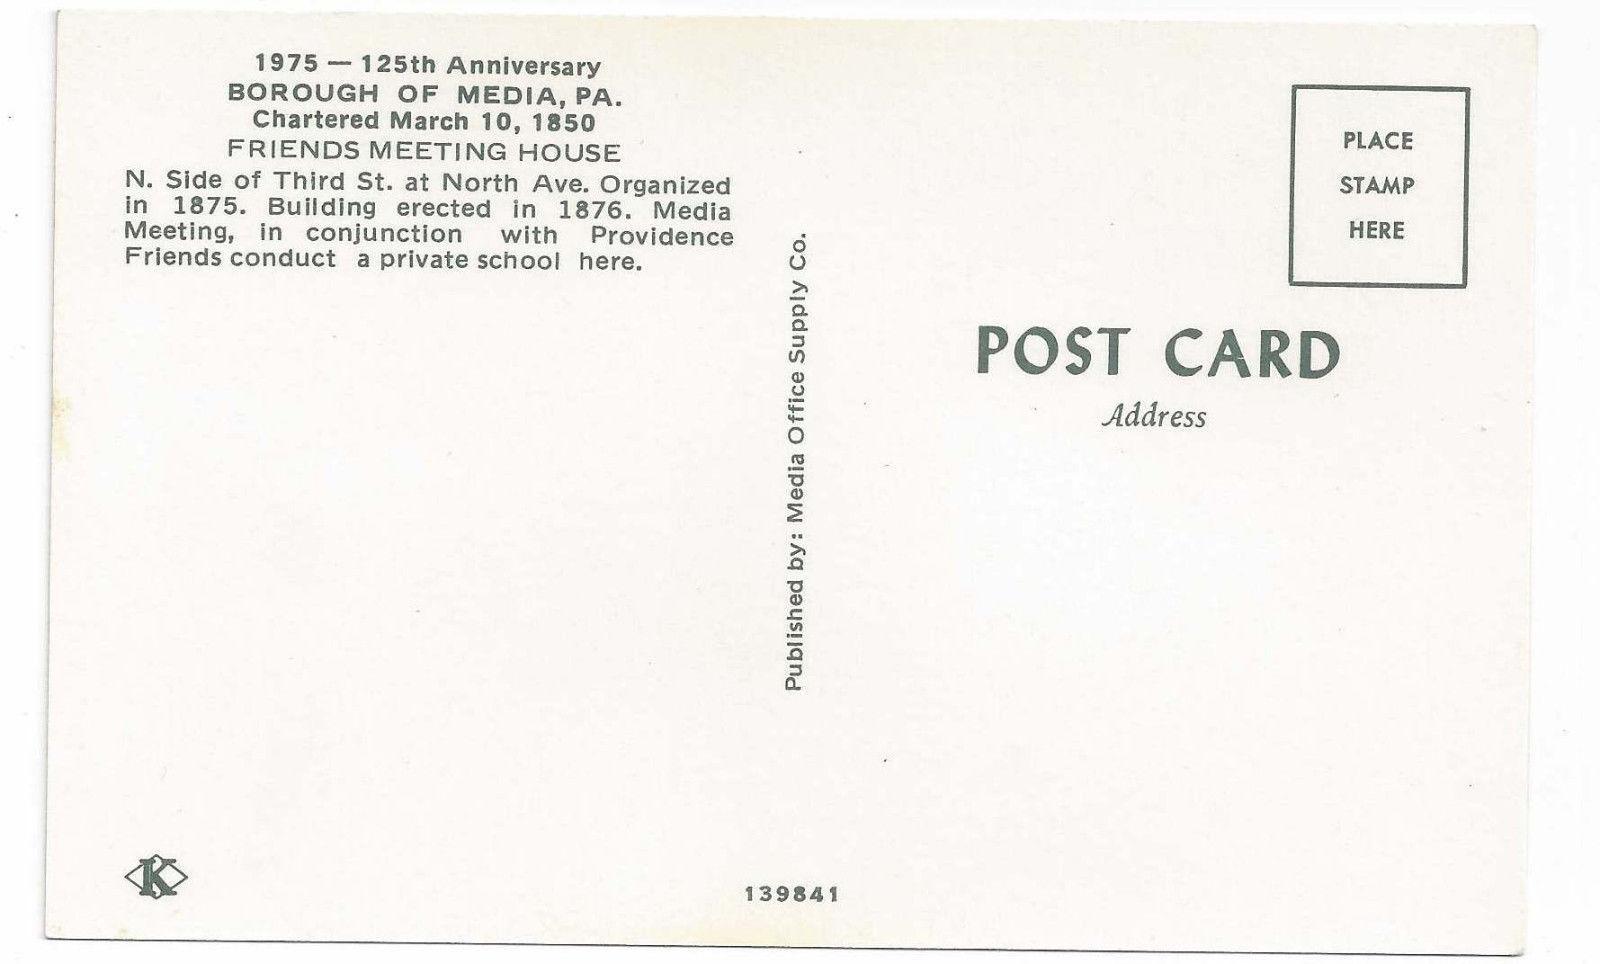 Media PA Friends Meeting Quaker School 1975 125th Anniv Vintage Postcard